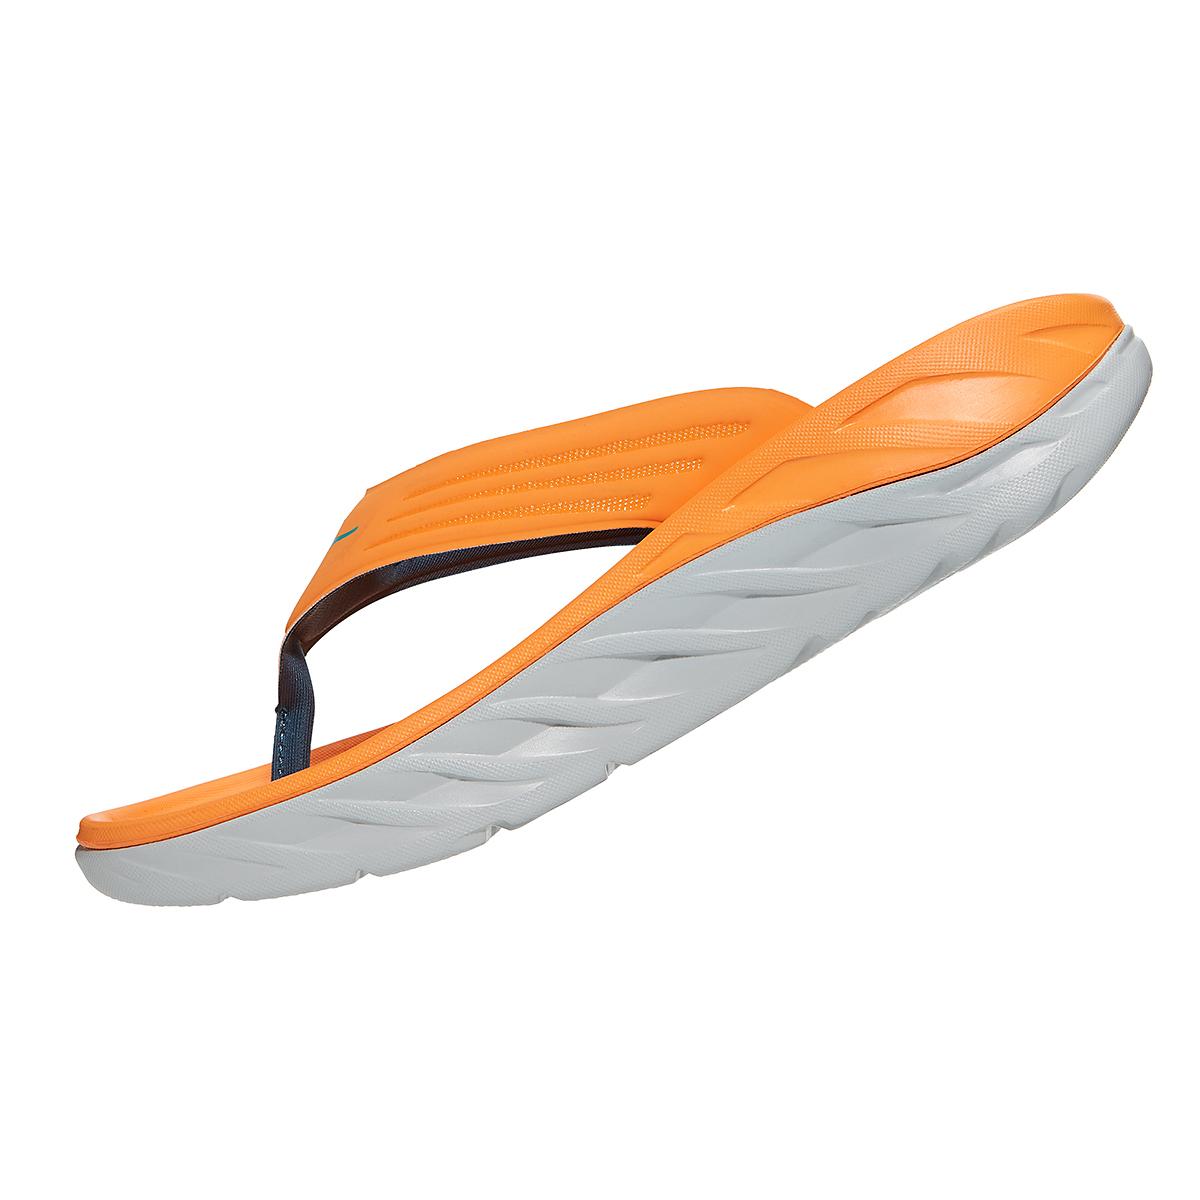 Men's Hoka One One Ora Recovery Flip 2 - Color: Blazing Orange/Lunar Rock - Size: 7 - Width: Regular, Blazing Orange/Lunar Rock, large, image 4